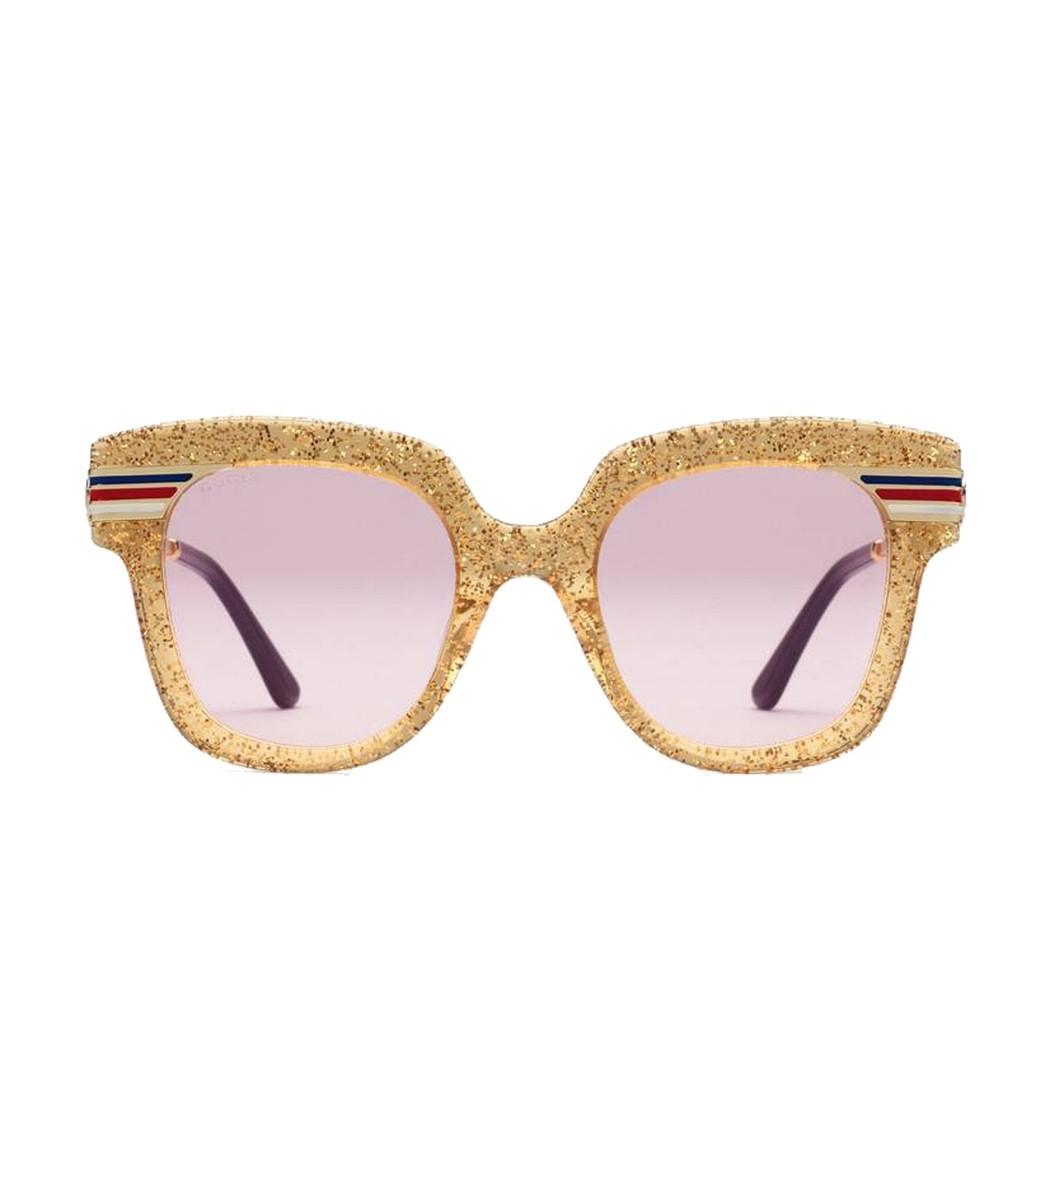 899fe0259023c Gucci Glitter Acetate Sunglasses - ShopBAZAAR